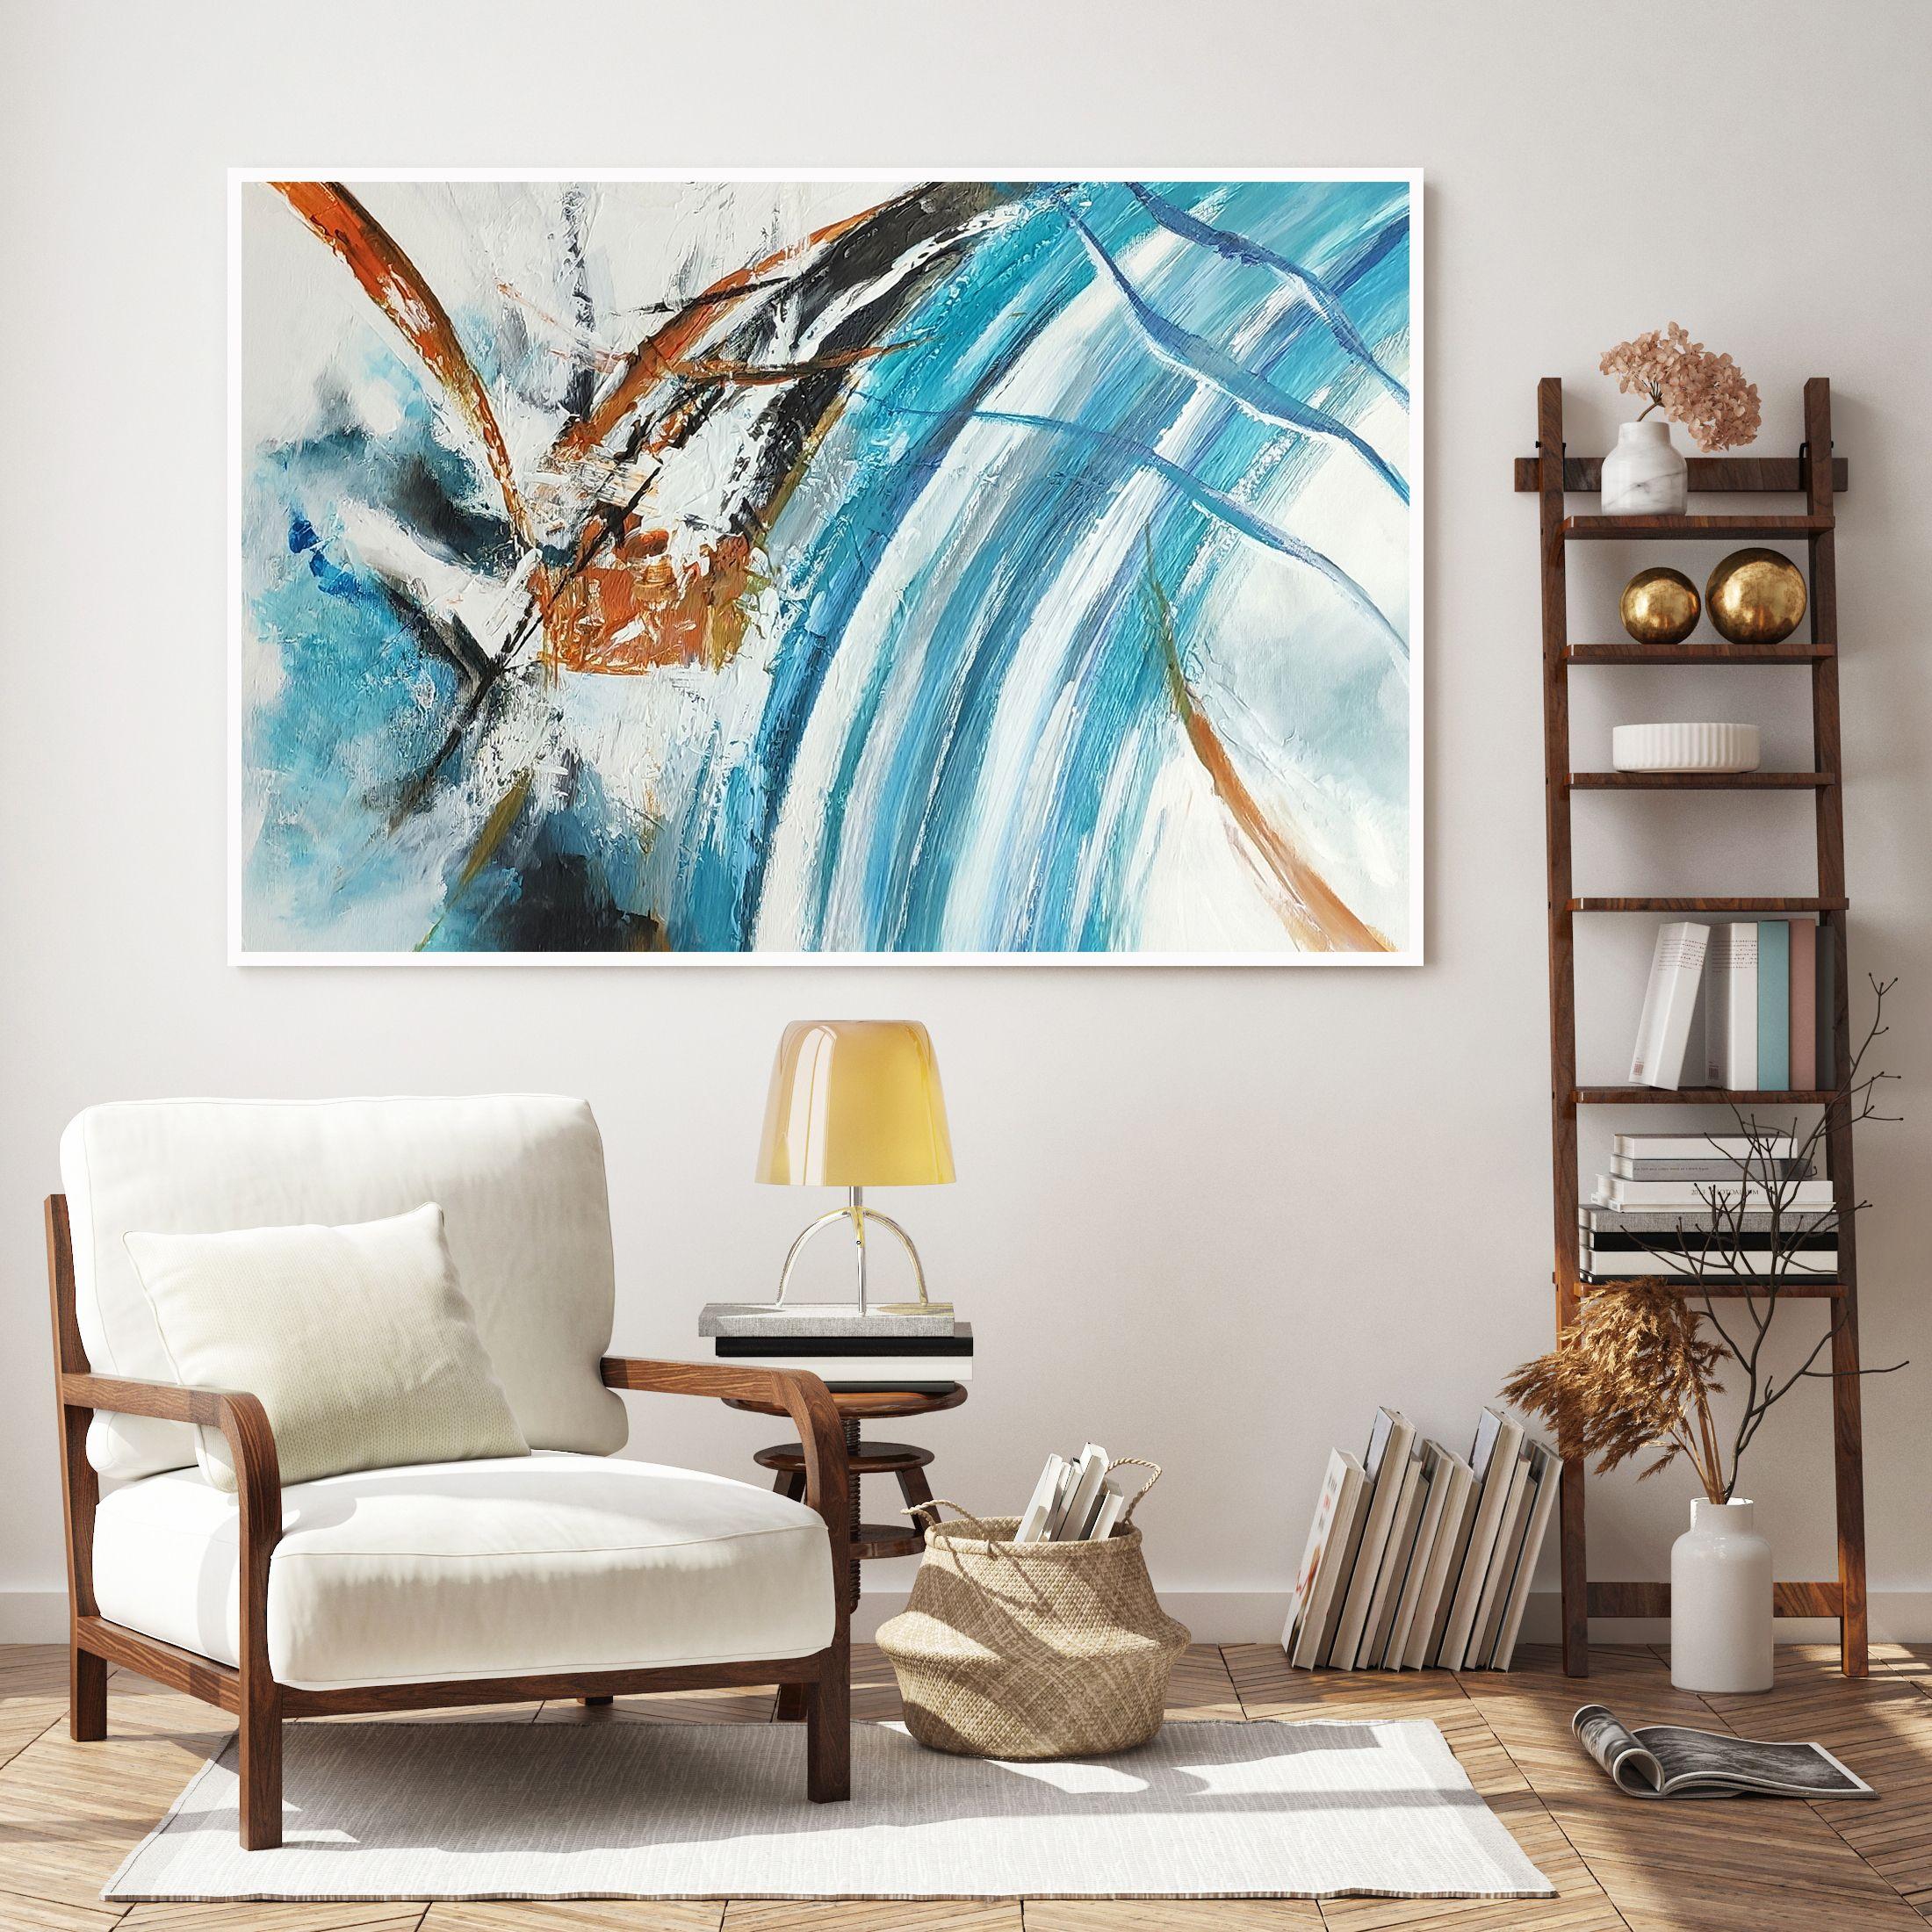 100% Original Handmade Art . #abstractpainting #largecanvasart #largeabstractart #originalartwork #originalart #abstractcanvas #texturepainting #homedecorart #roomdecor #roomdesign #livingroomdecor #wallart #wallartdecor #wallartprint